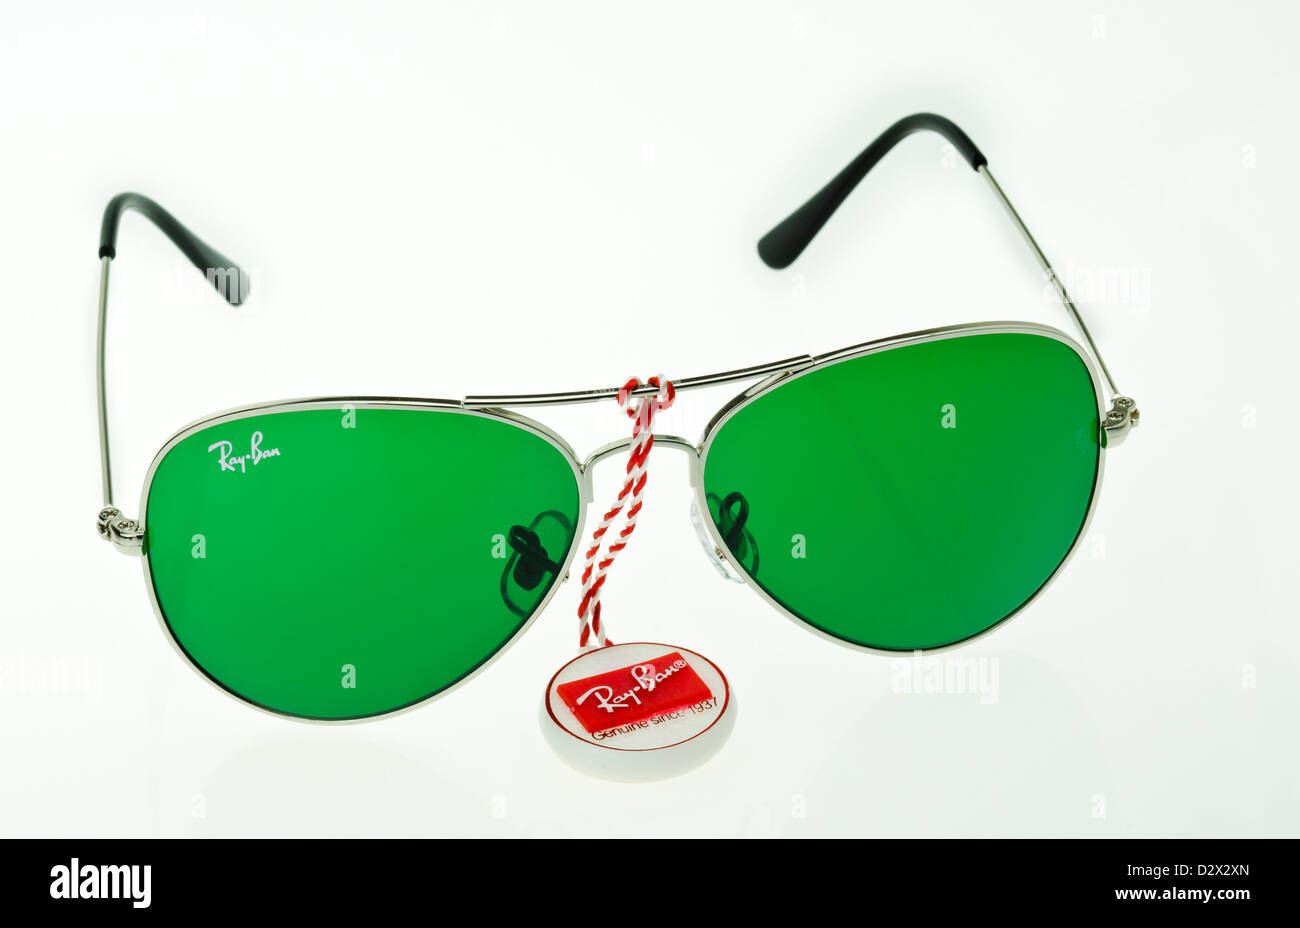 b05d0d56da Fake Ray Ban gafas de sol desde China Foto & Imagen De Stock ...